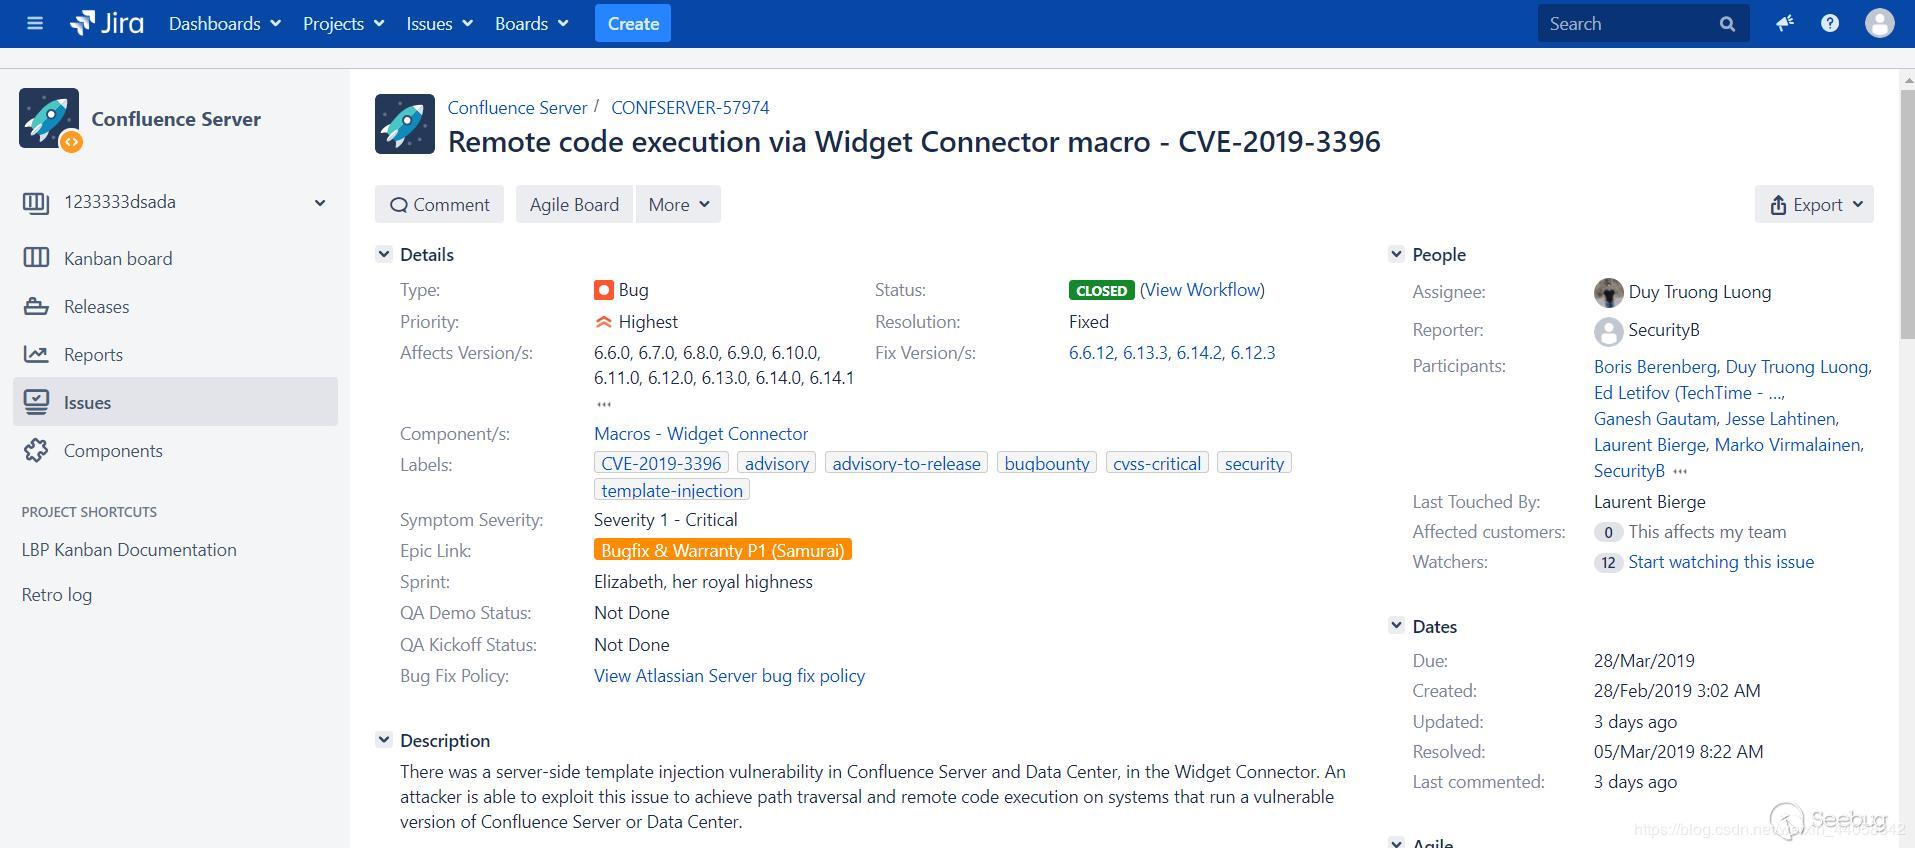 Confluence Unauthorized RCE (CVE-2019-3396) Vulnerability